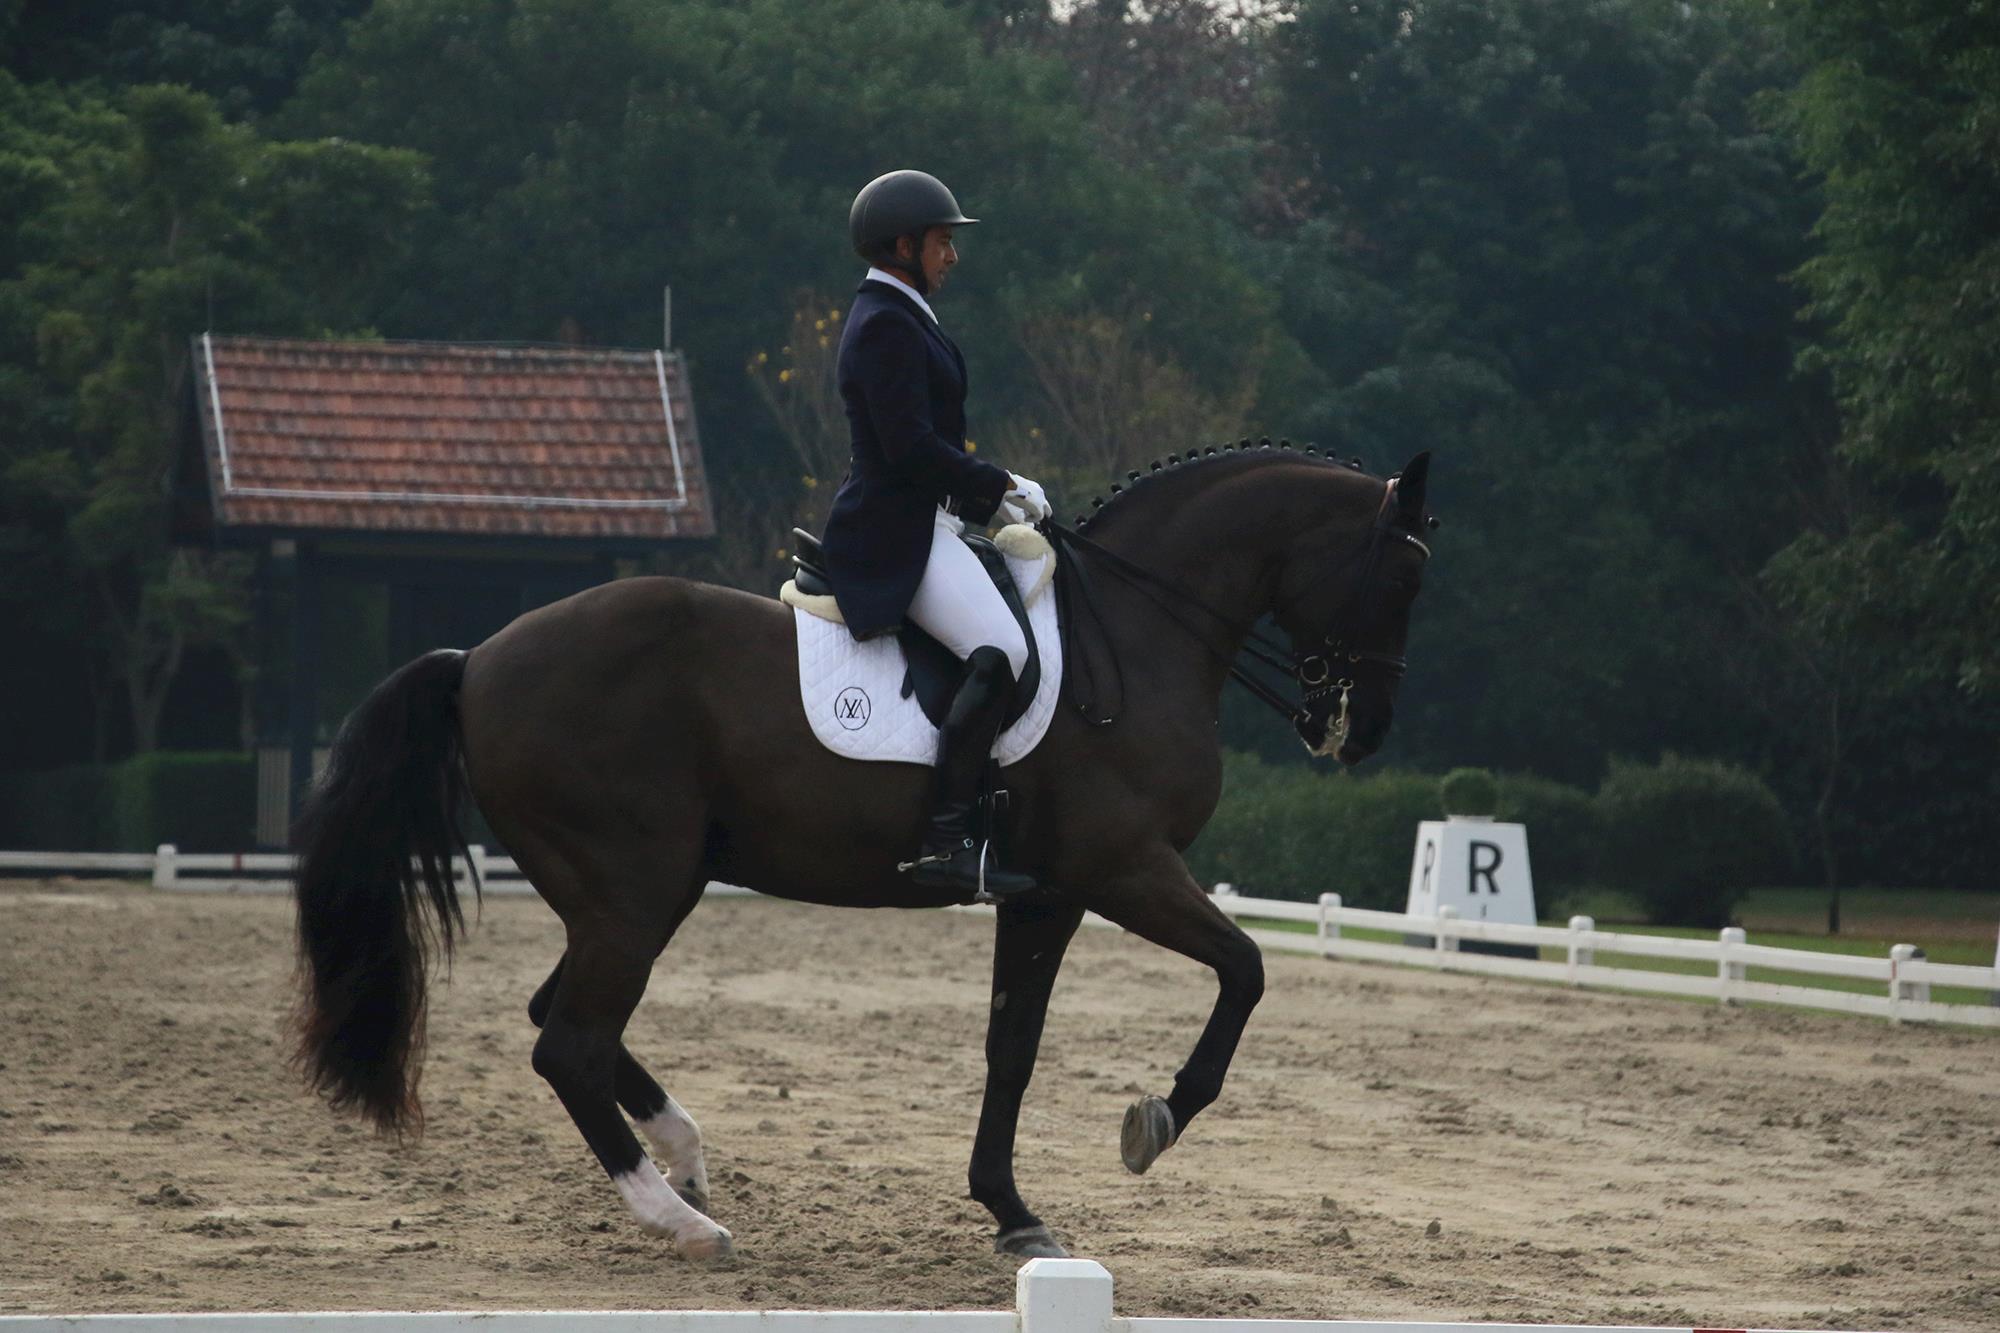 adestramento weg 2018, weg 2018, Jogos Equestres, Erika Costa